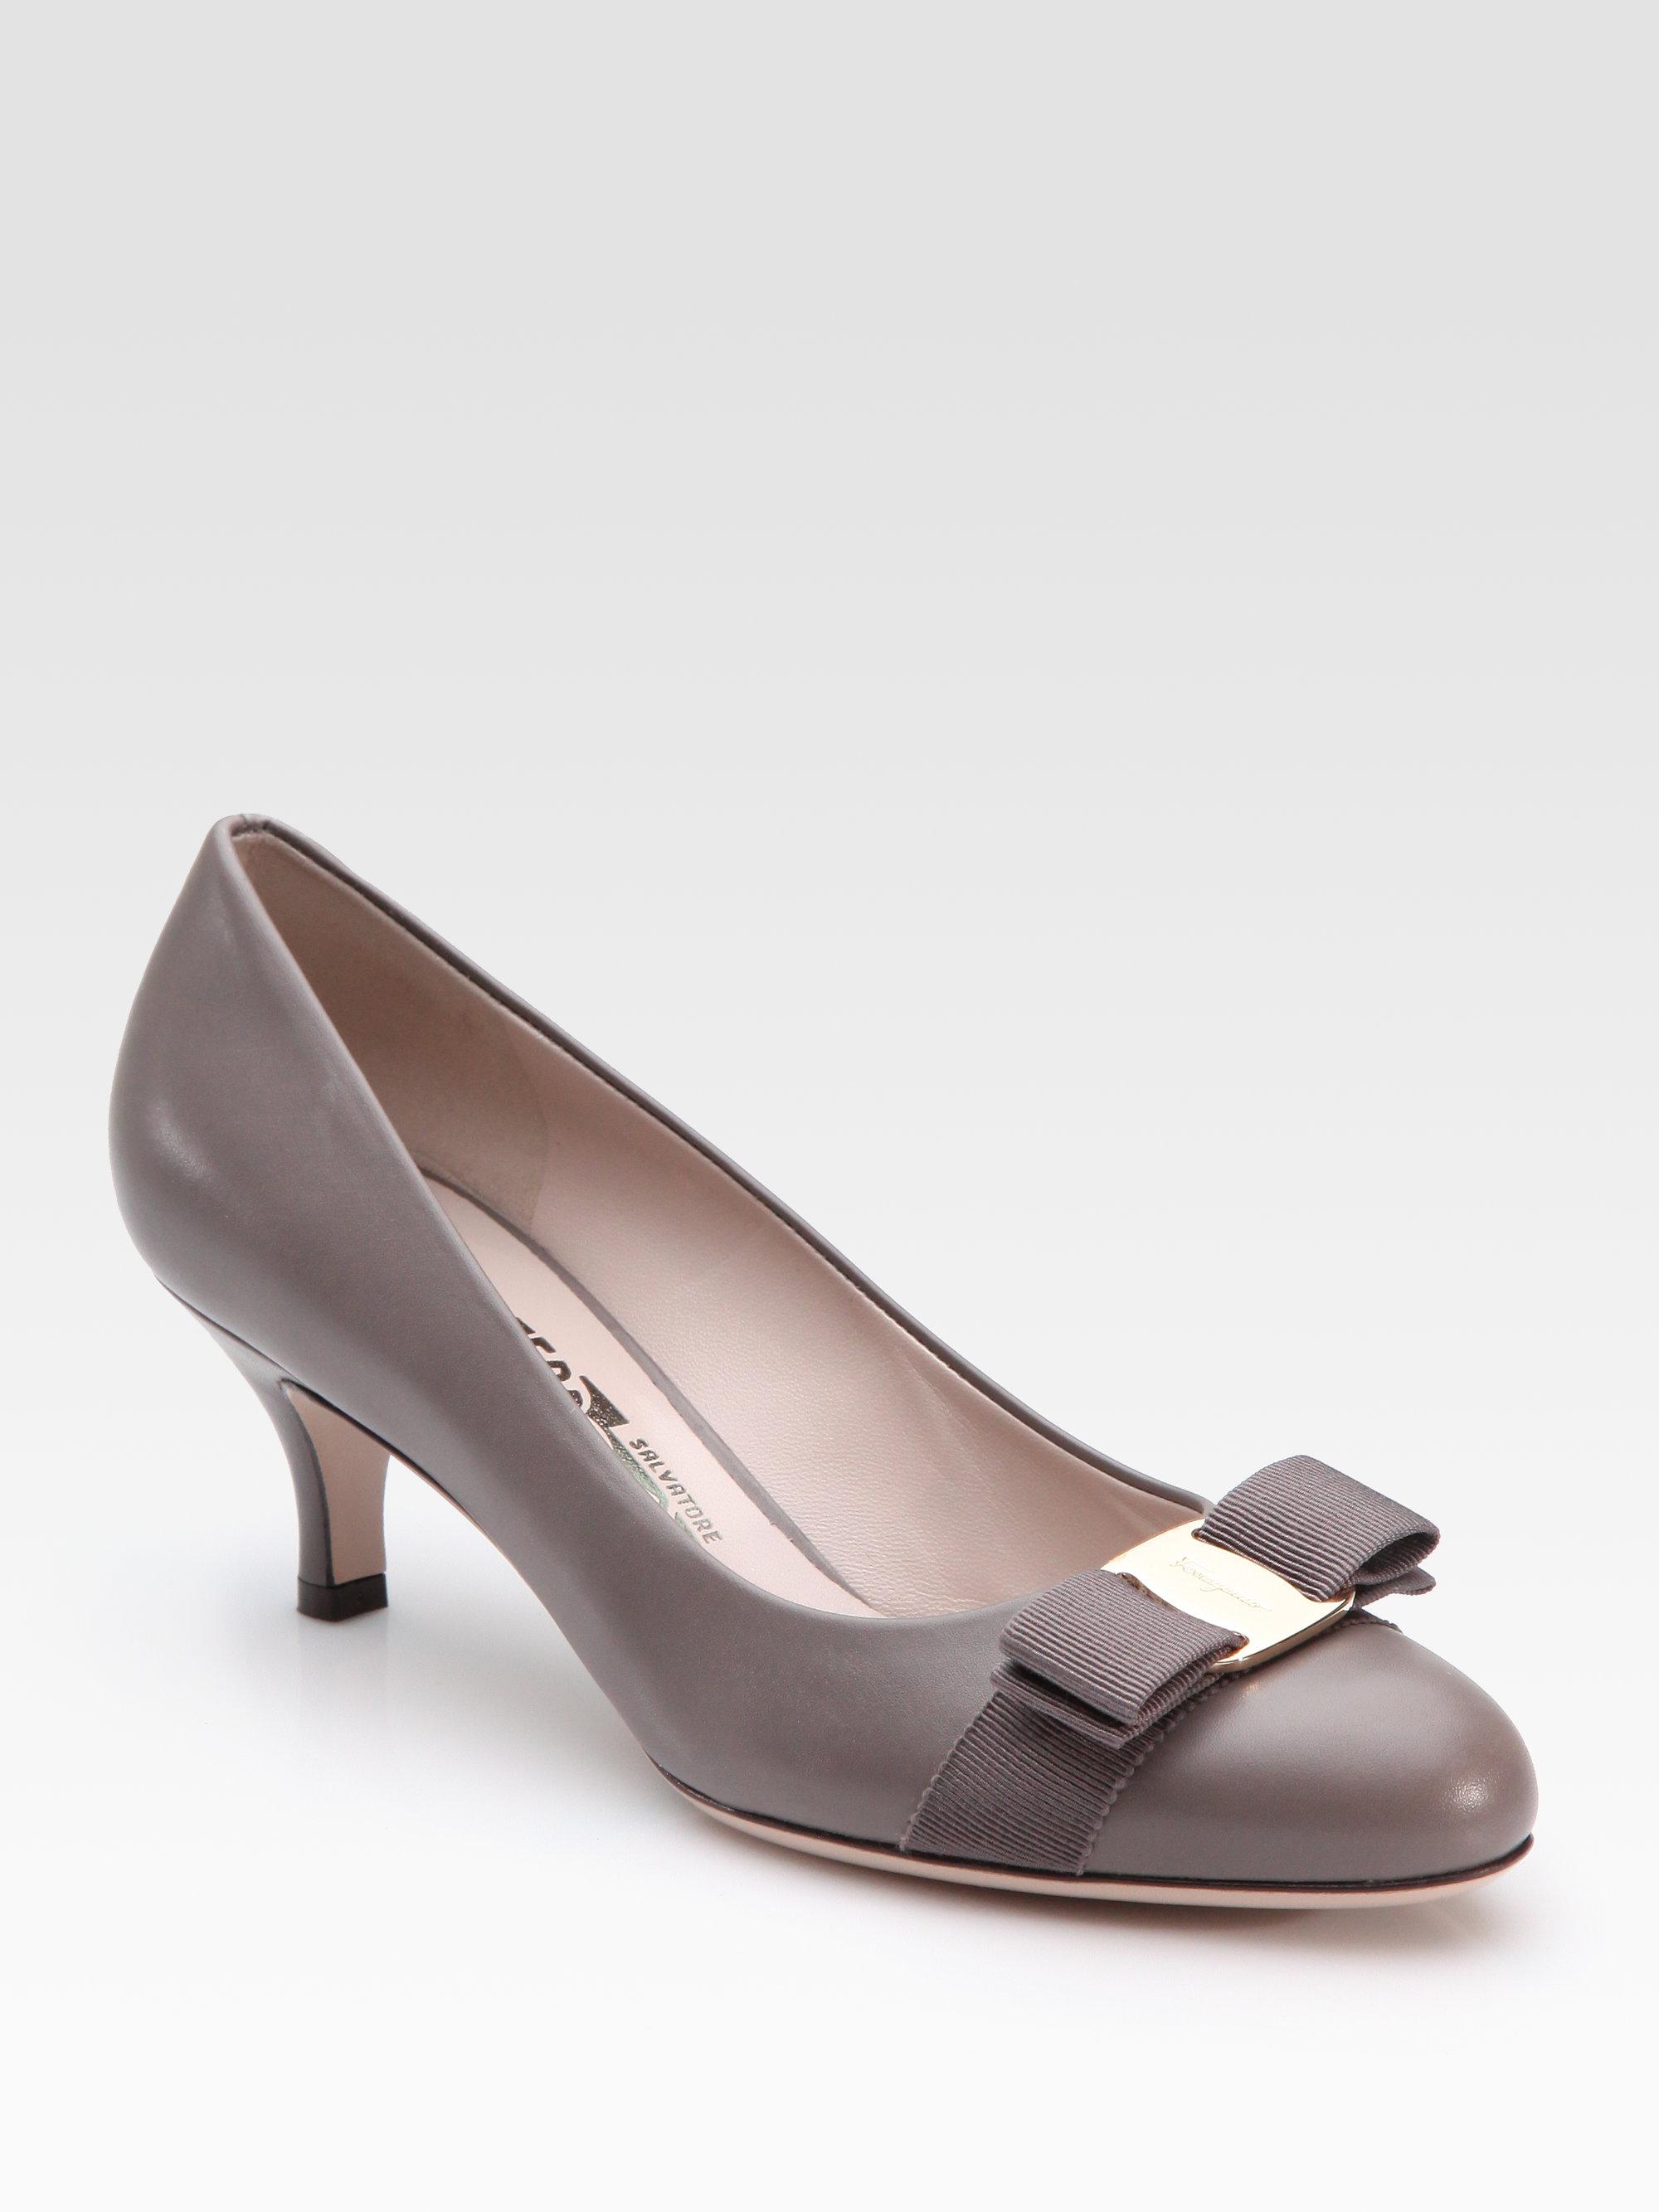 Ferragamo Vara Shoes Sale